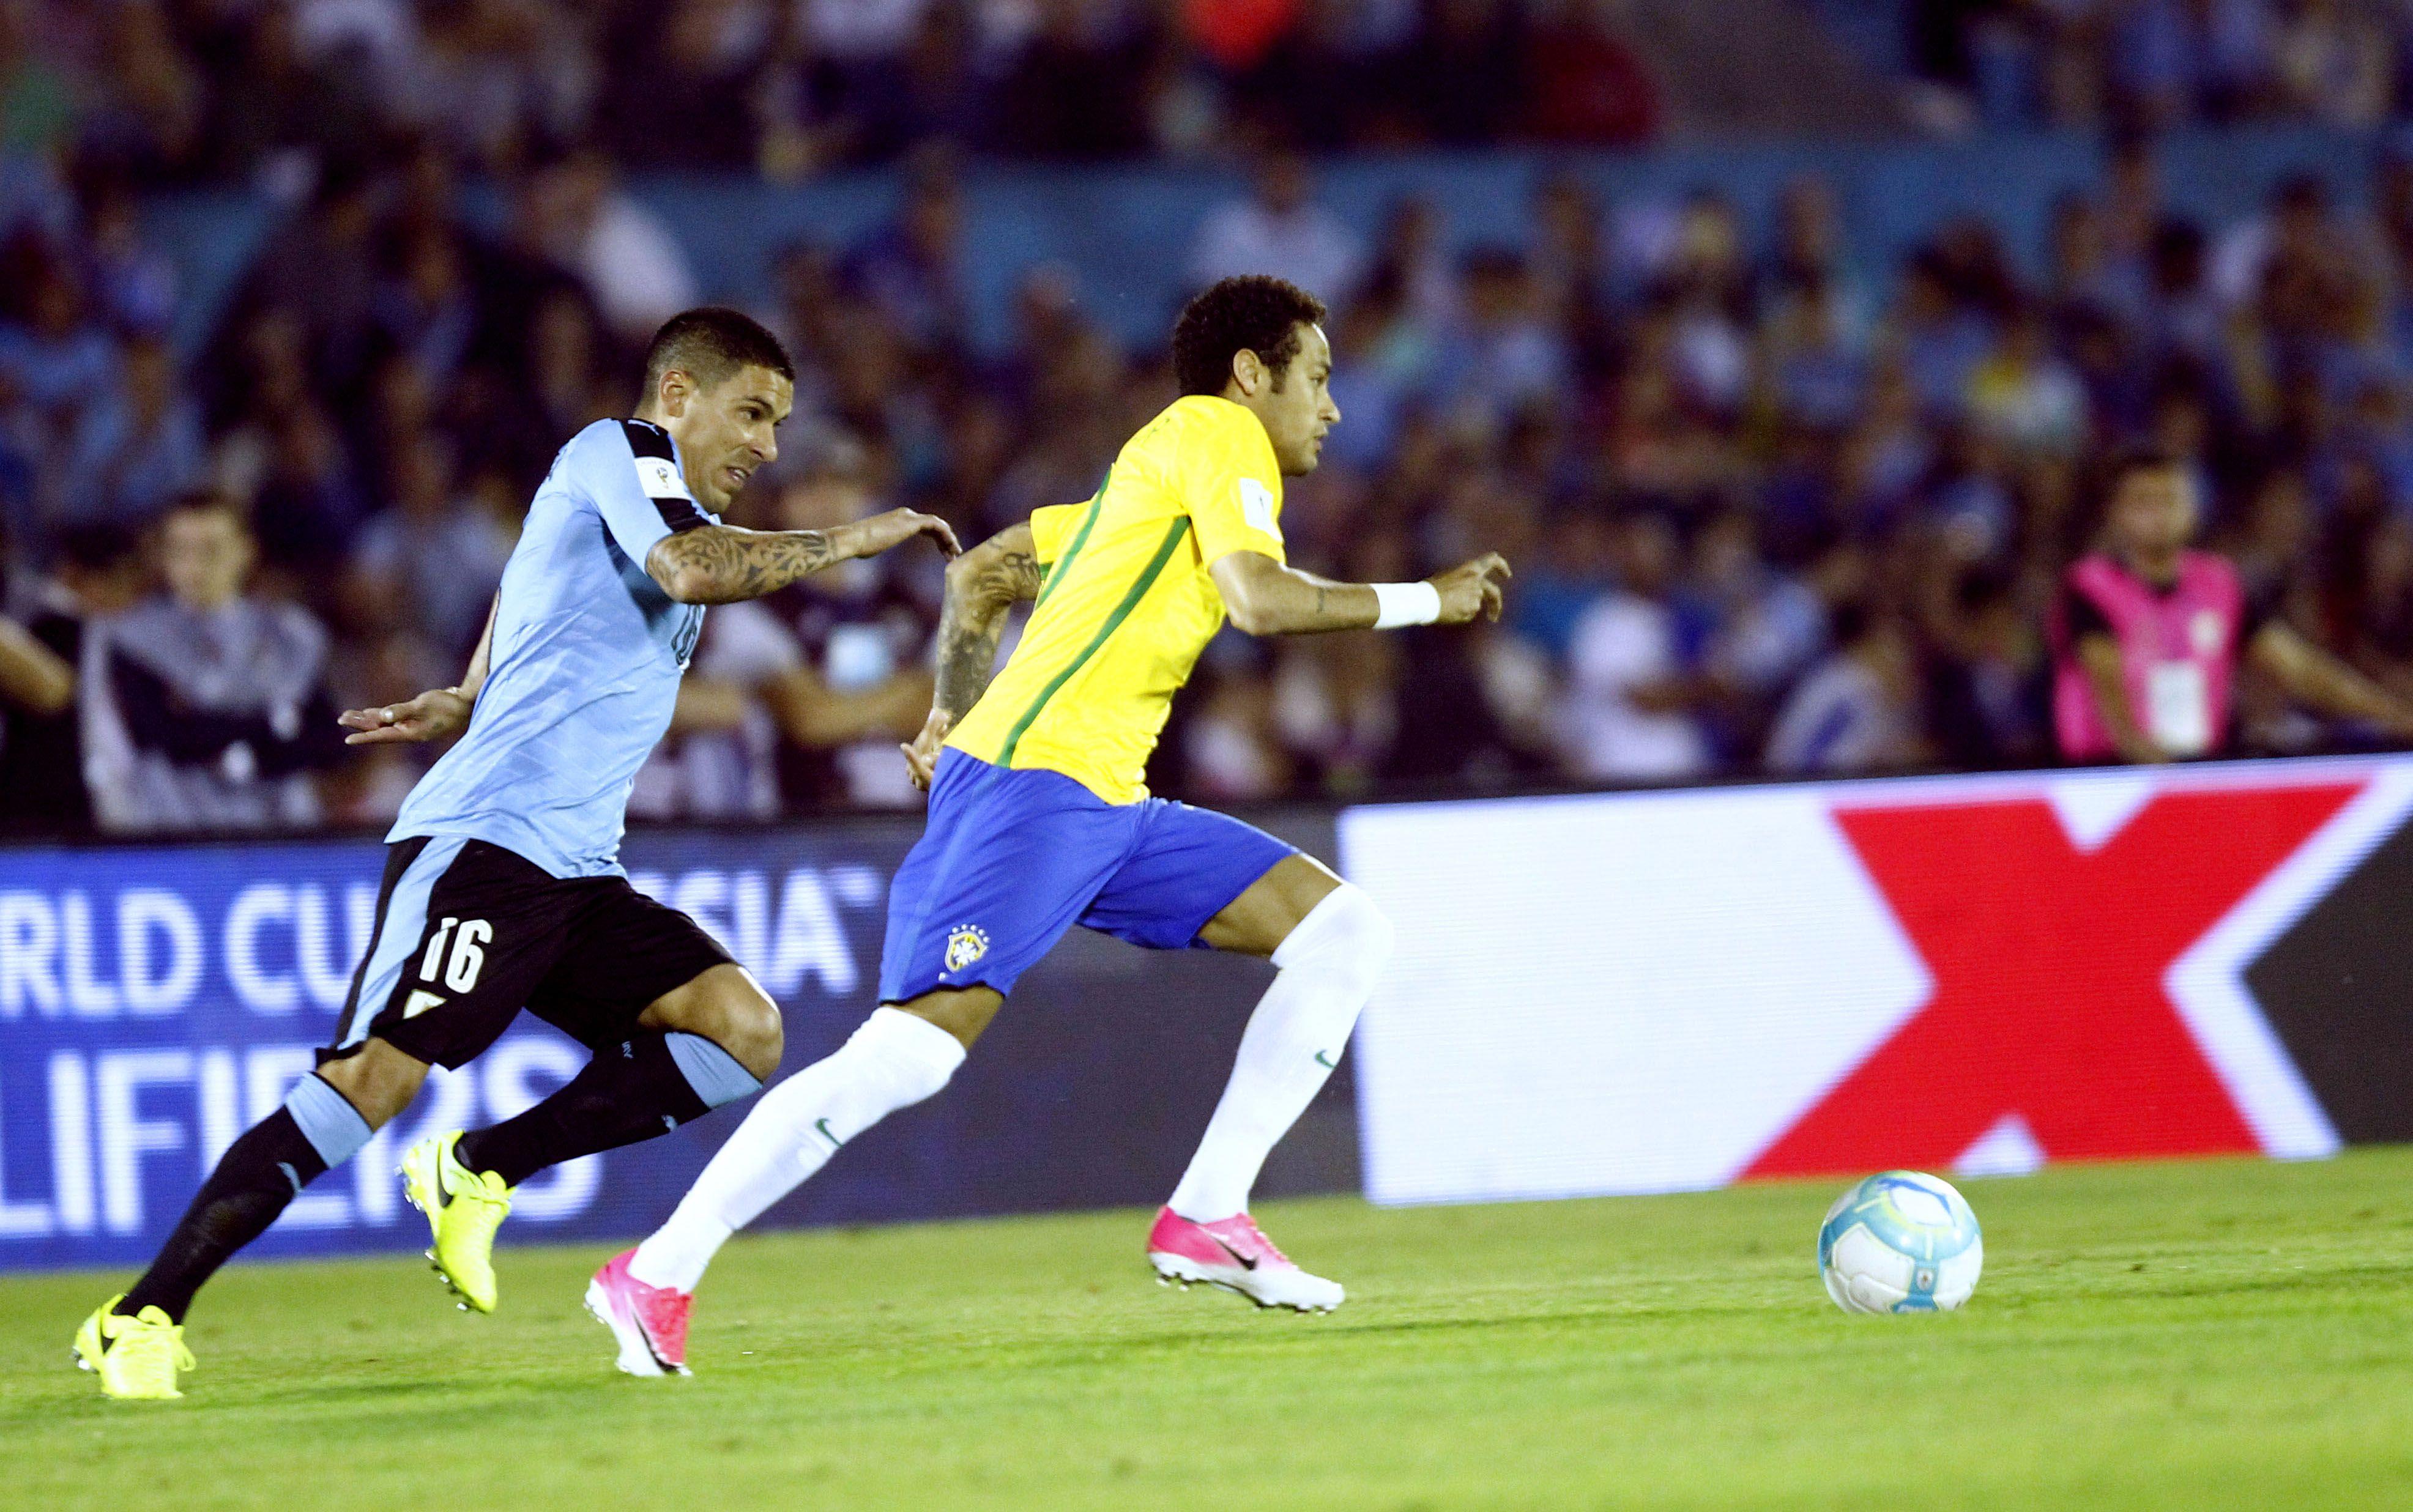 La escapada de Neymar ante Maxi Pereira